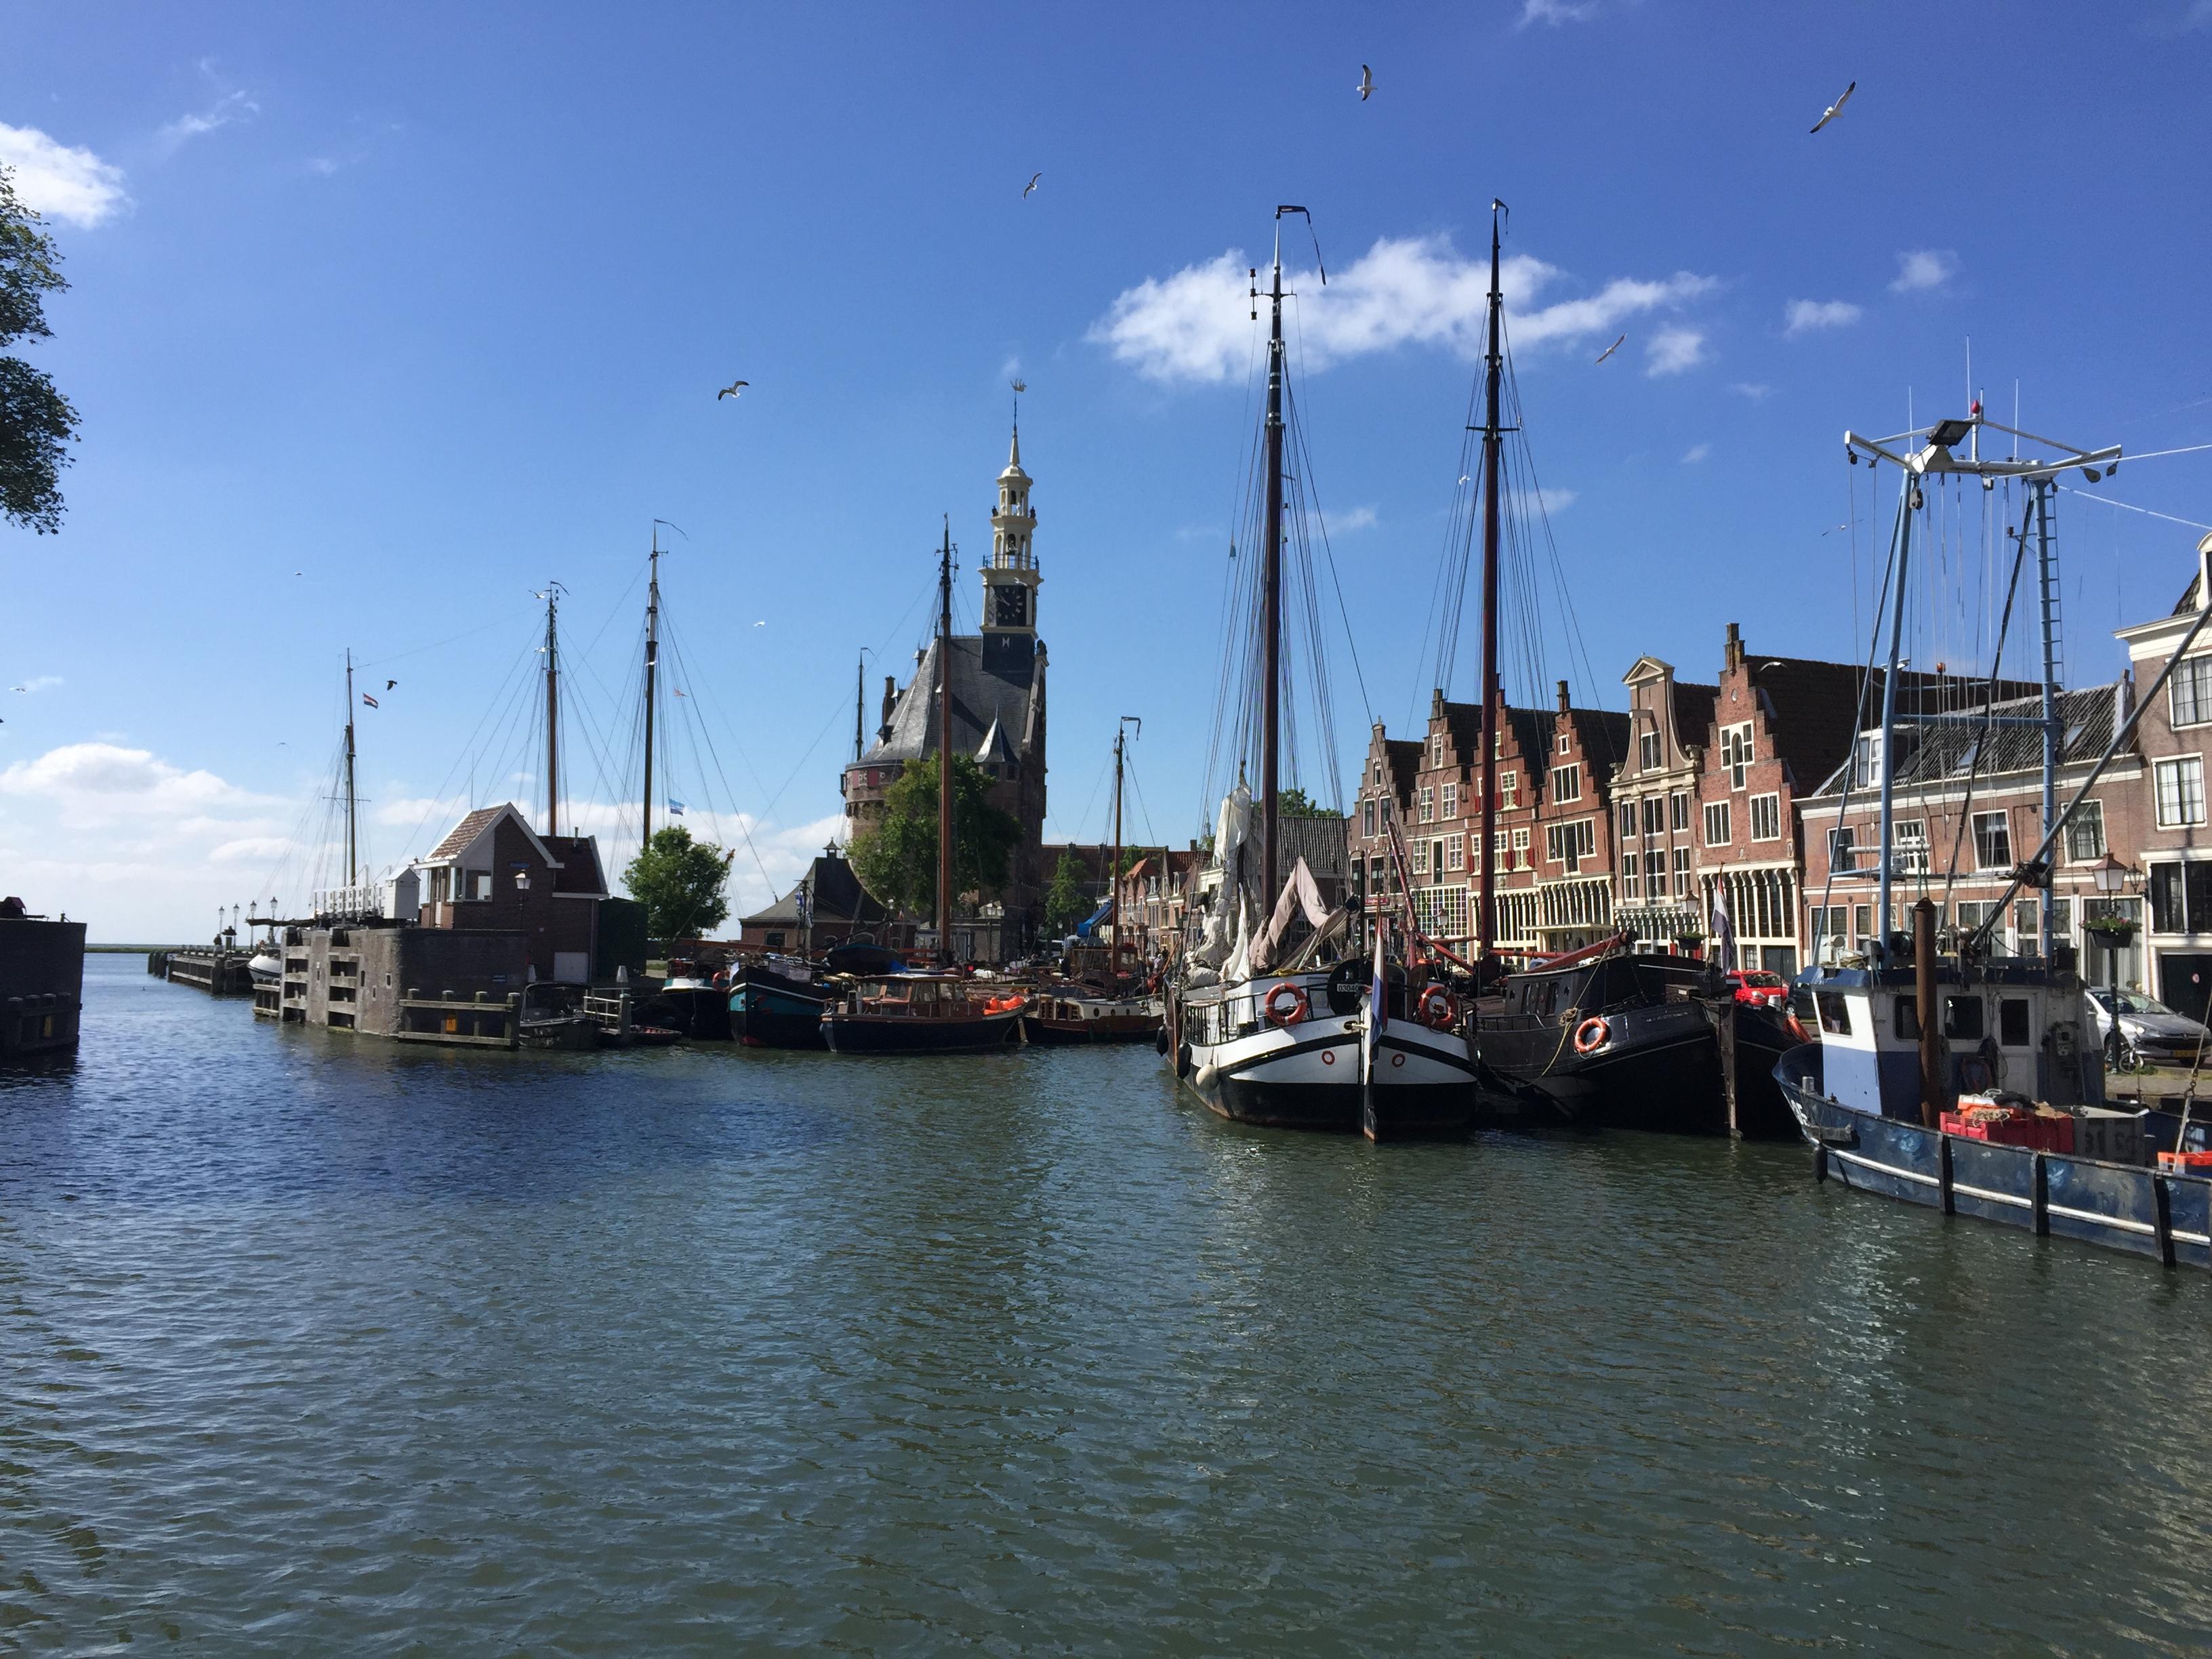 Stadswandeling Hoorn | Rondleiding Hoorn